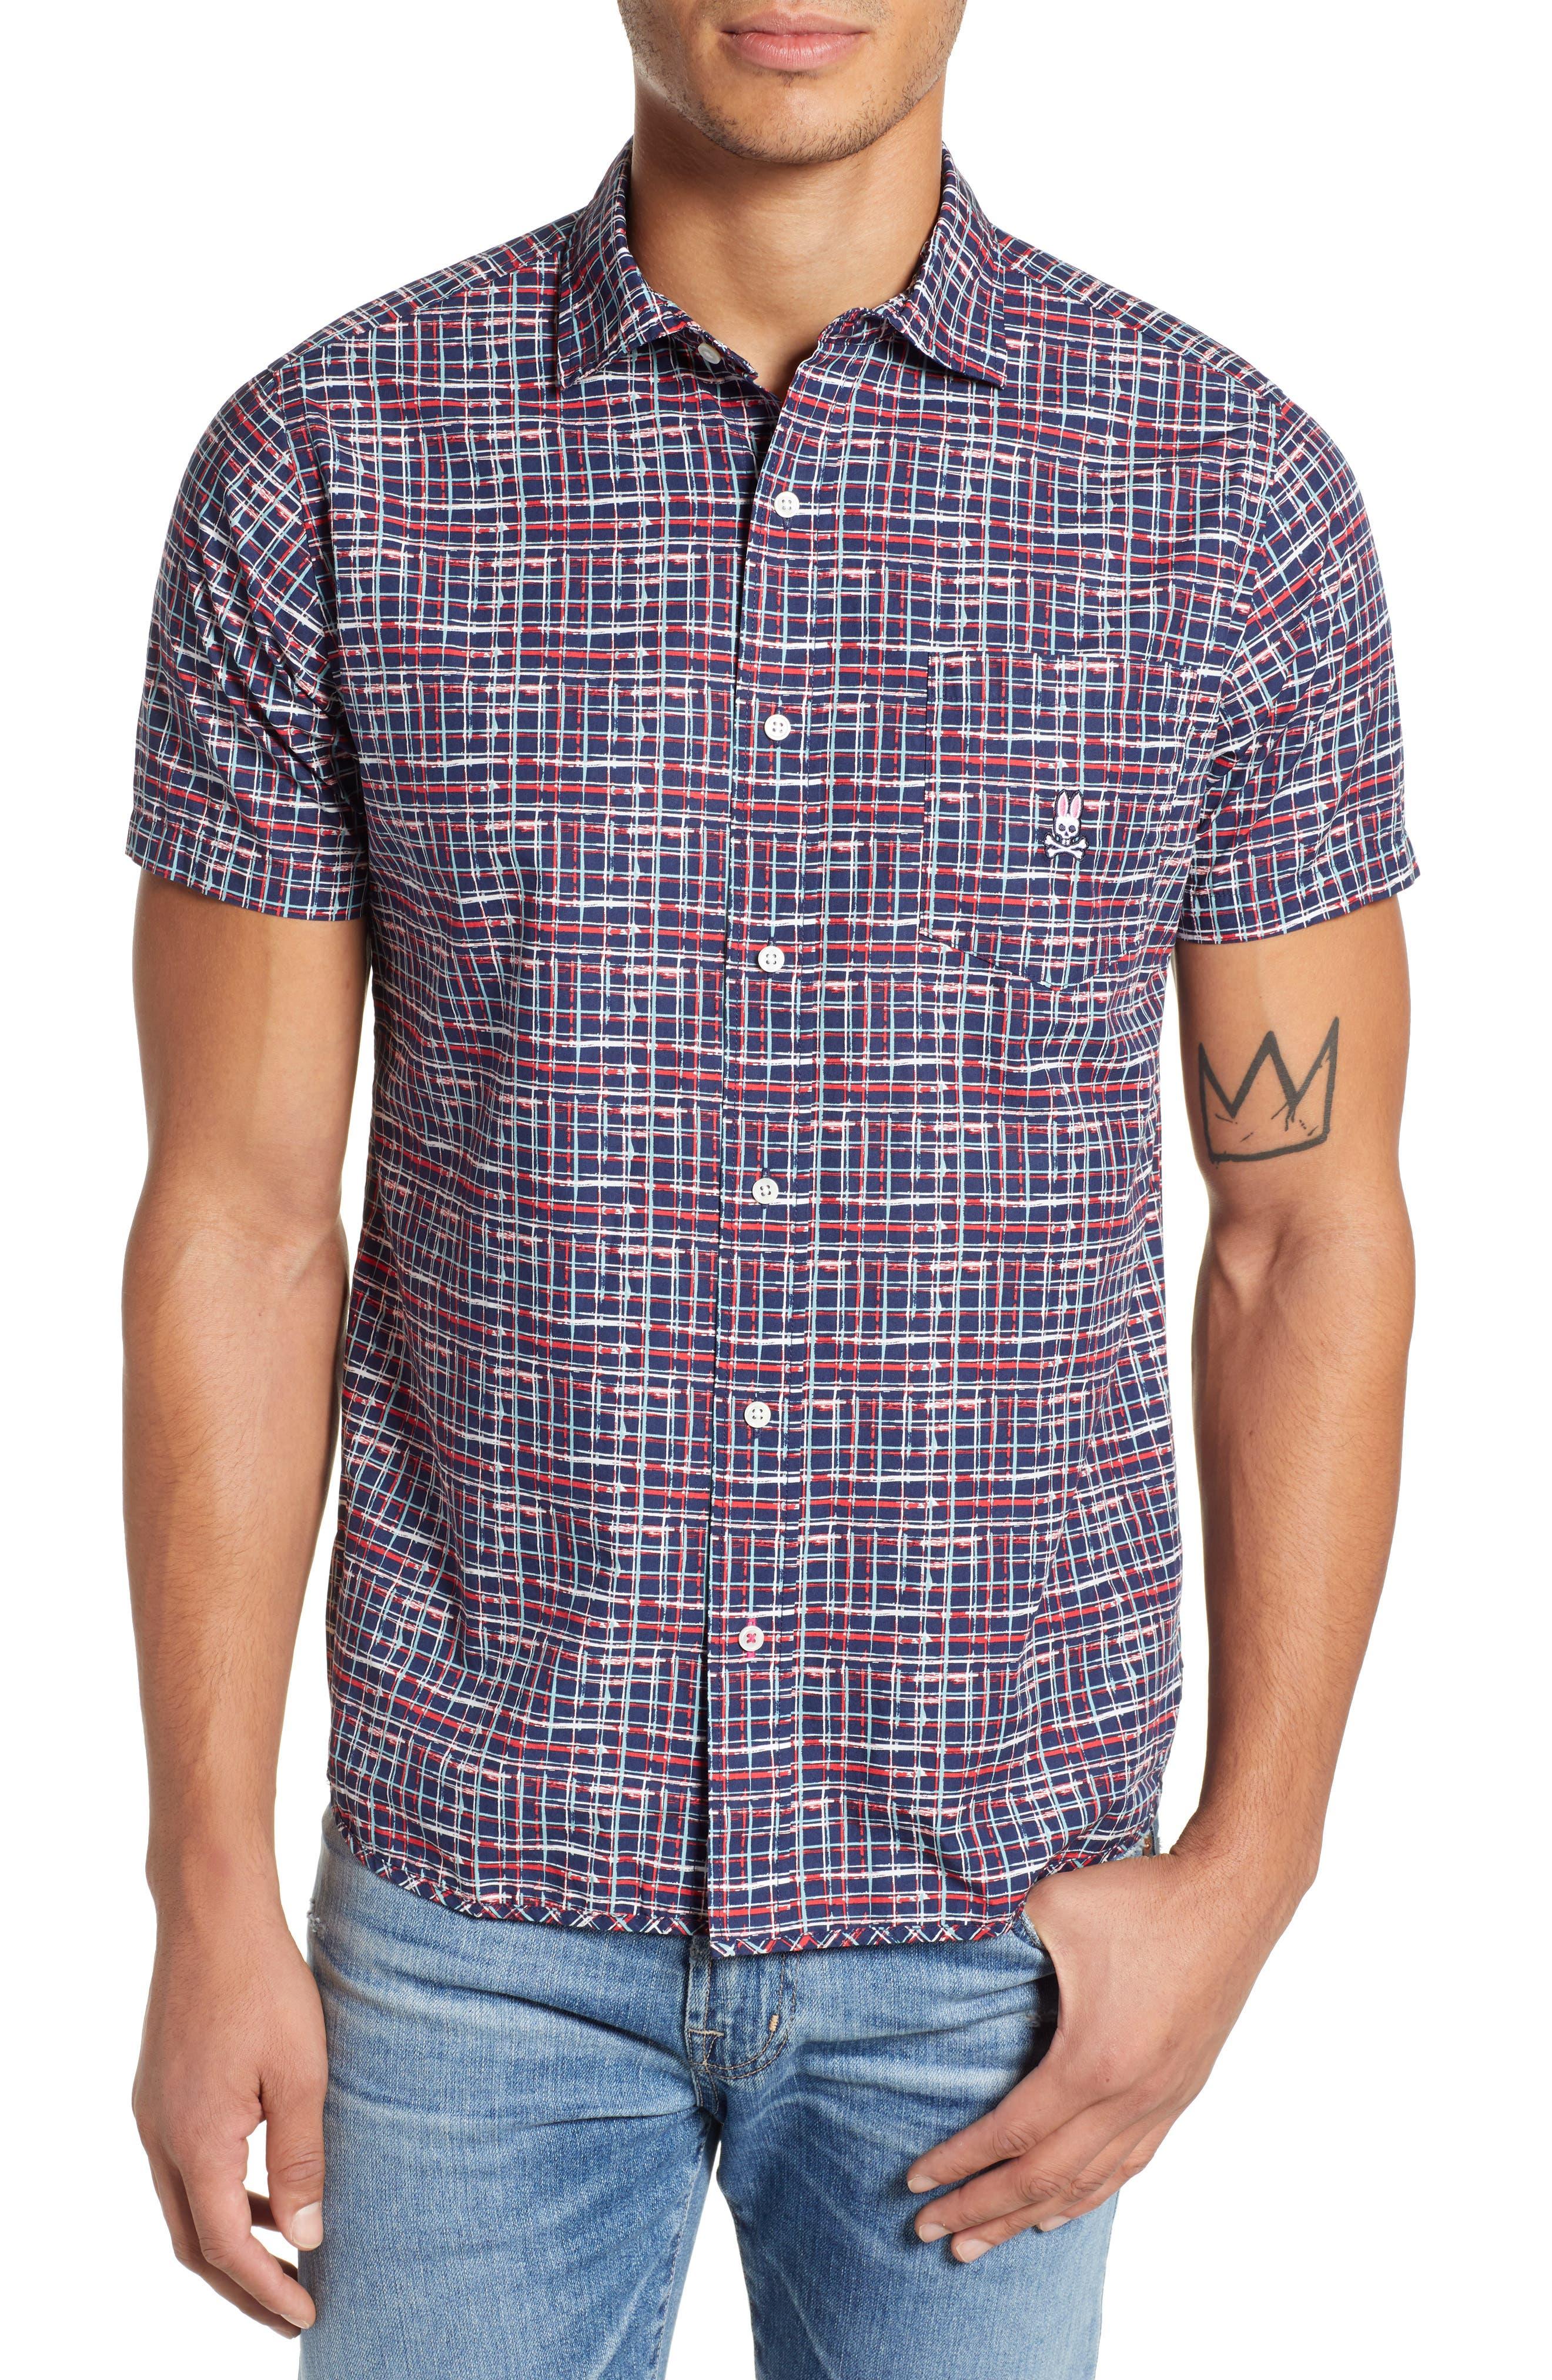 PSYCHO BUNNY Grid Print Camp Shirt, Main, color, CASSIS